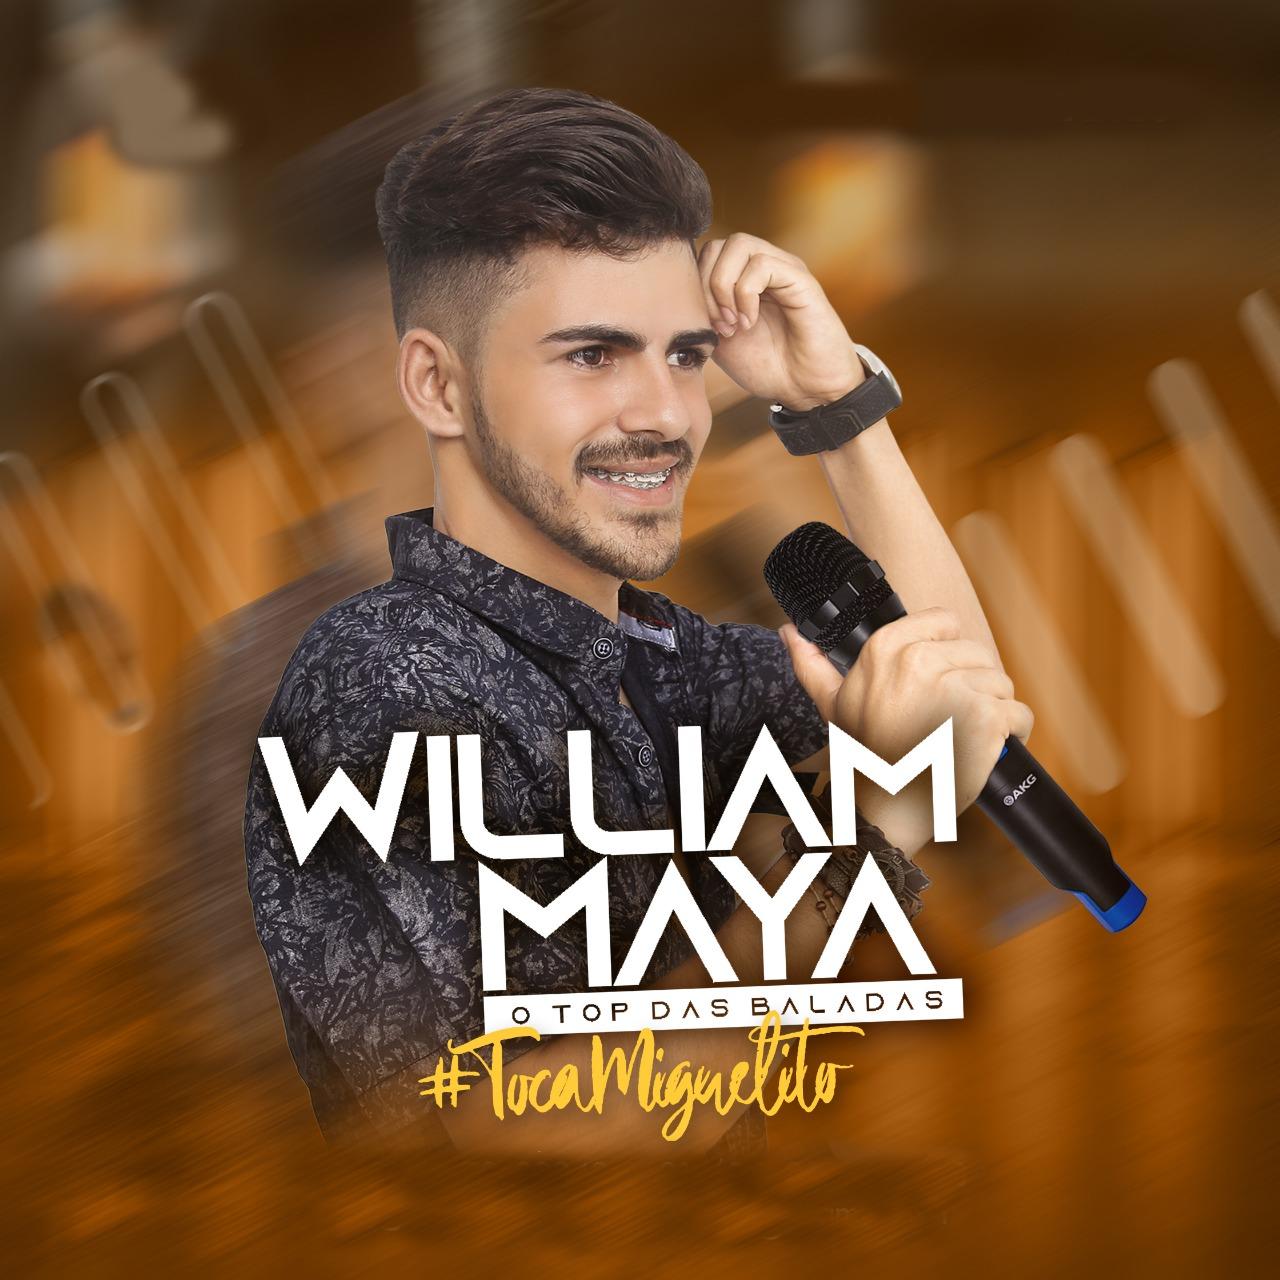 William Maya